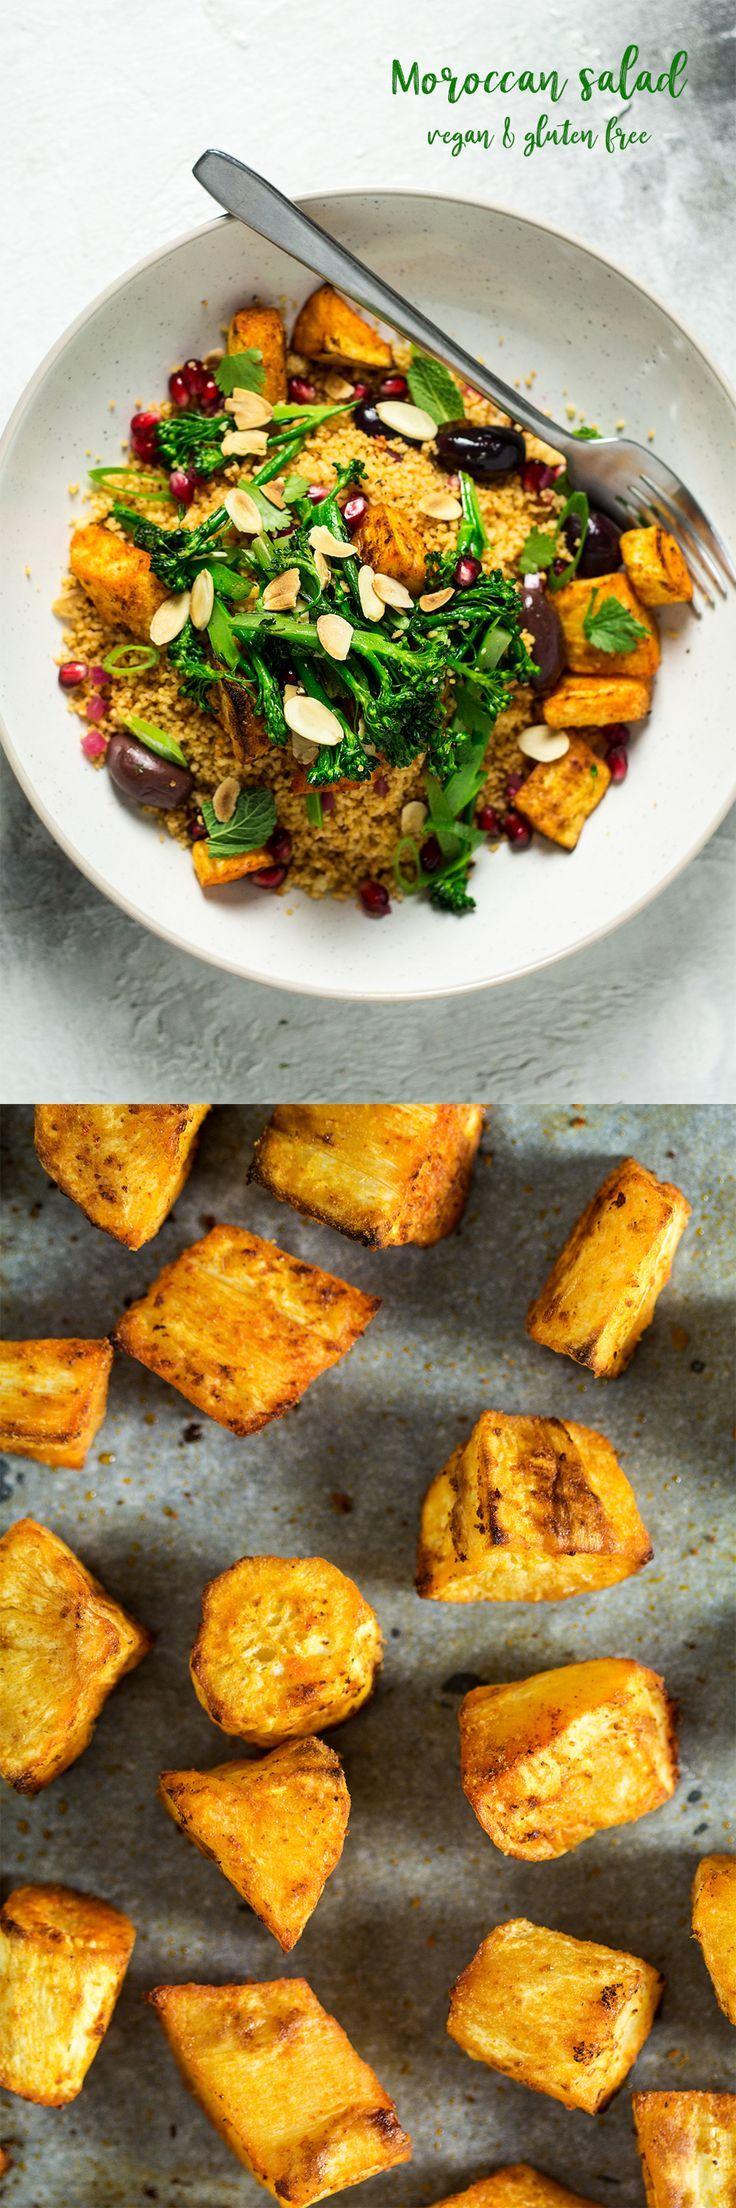 #salad #moroccan #healthy #vegan #dairyfree #vegetarian #glutenfree #lunch #entree